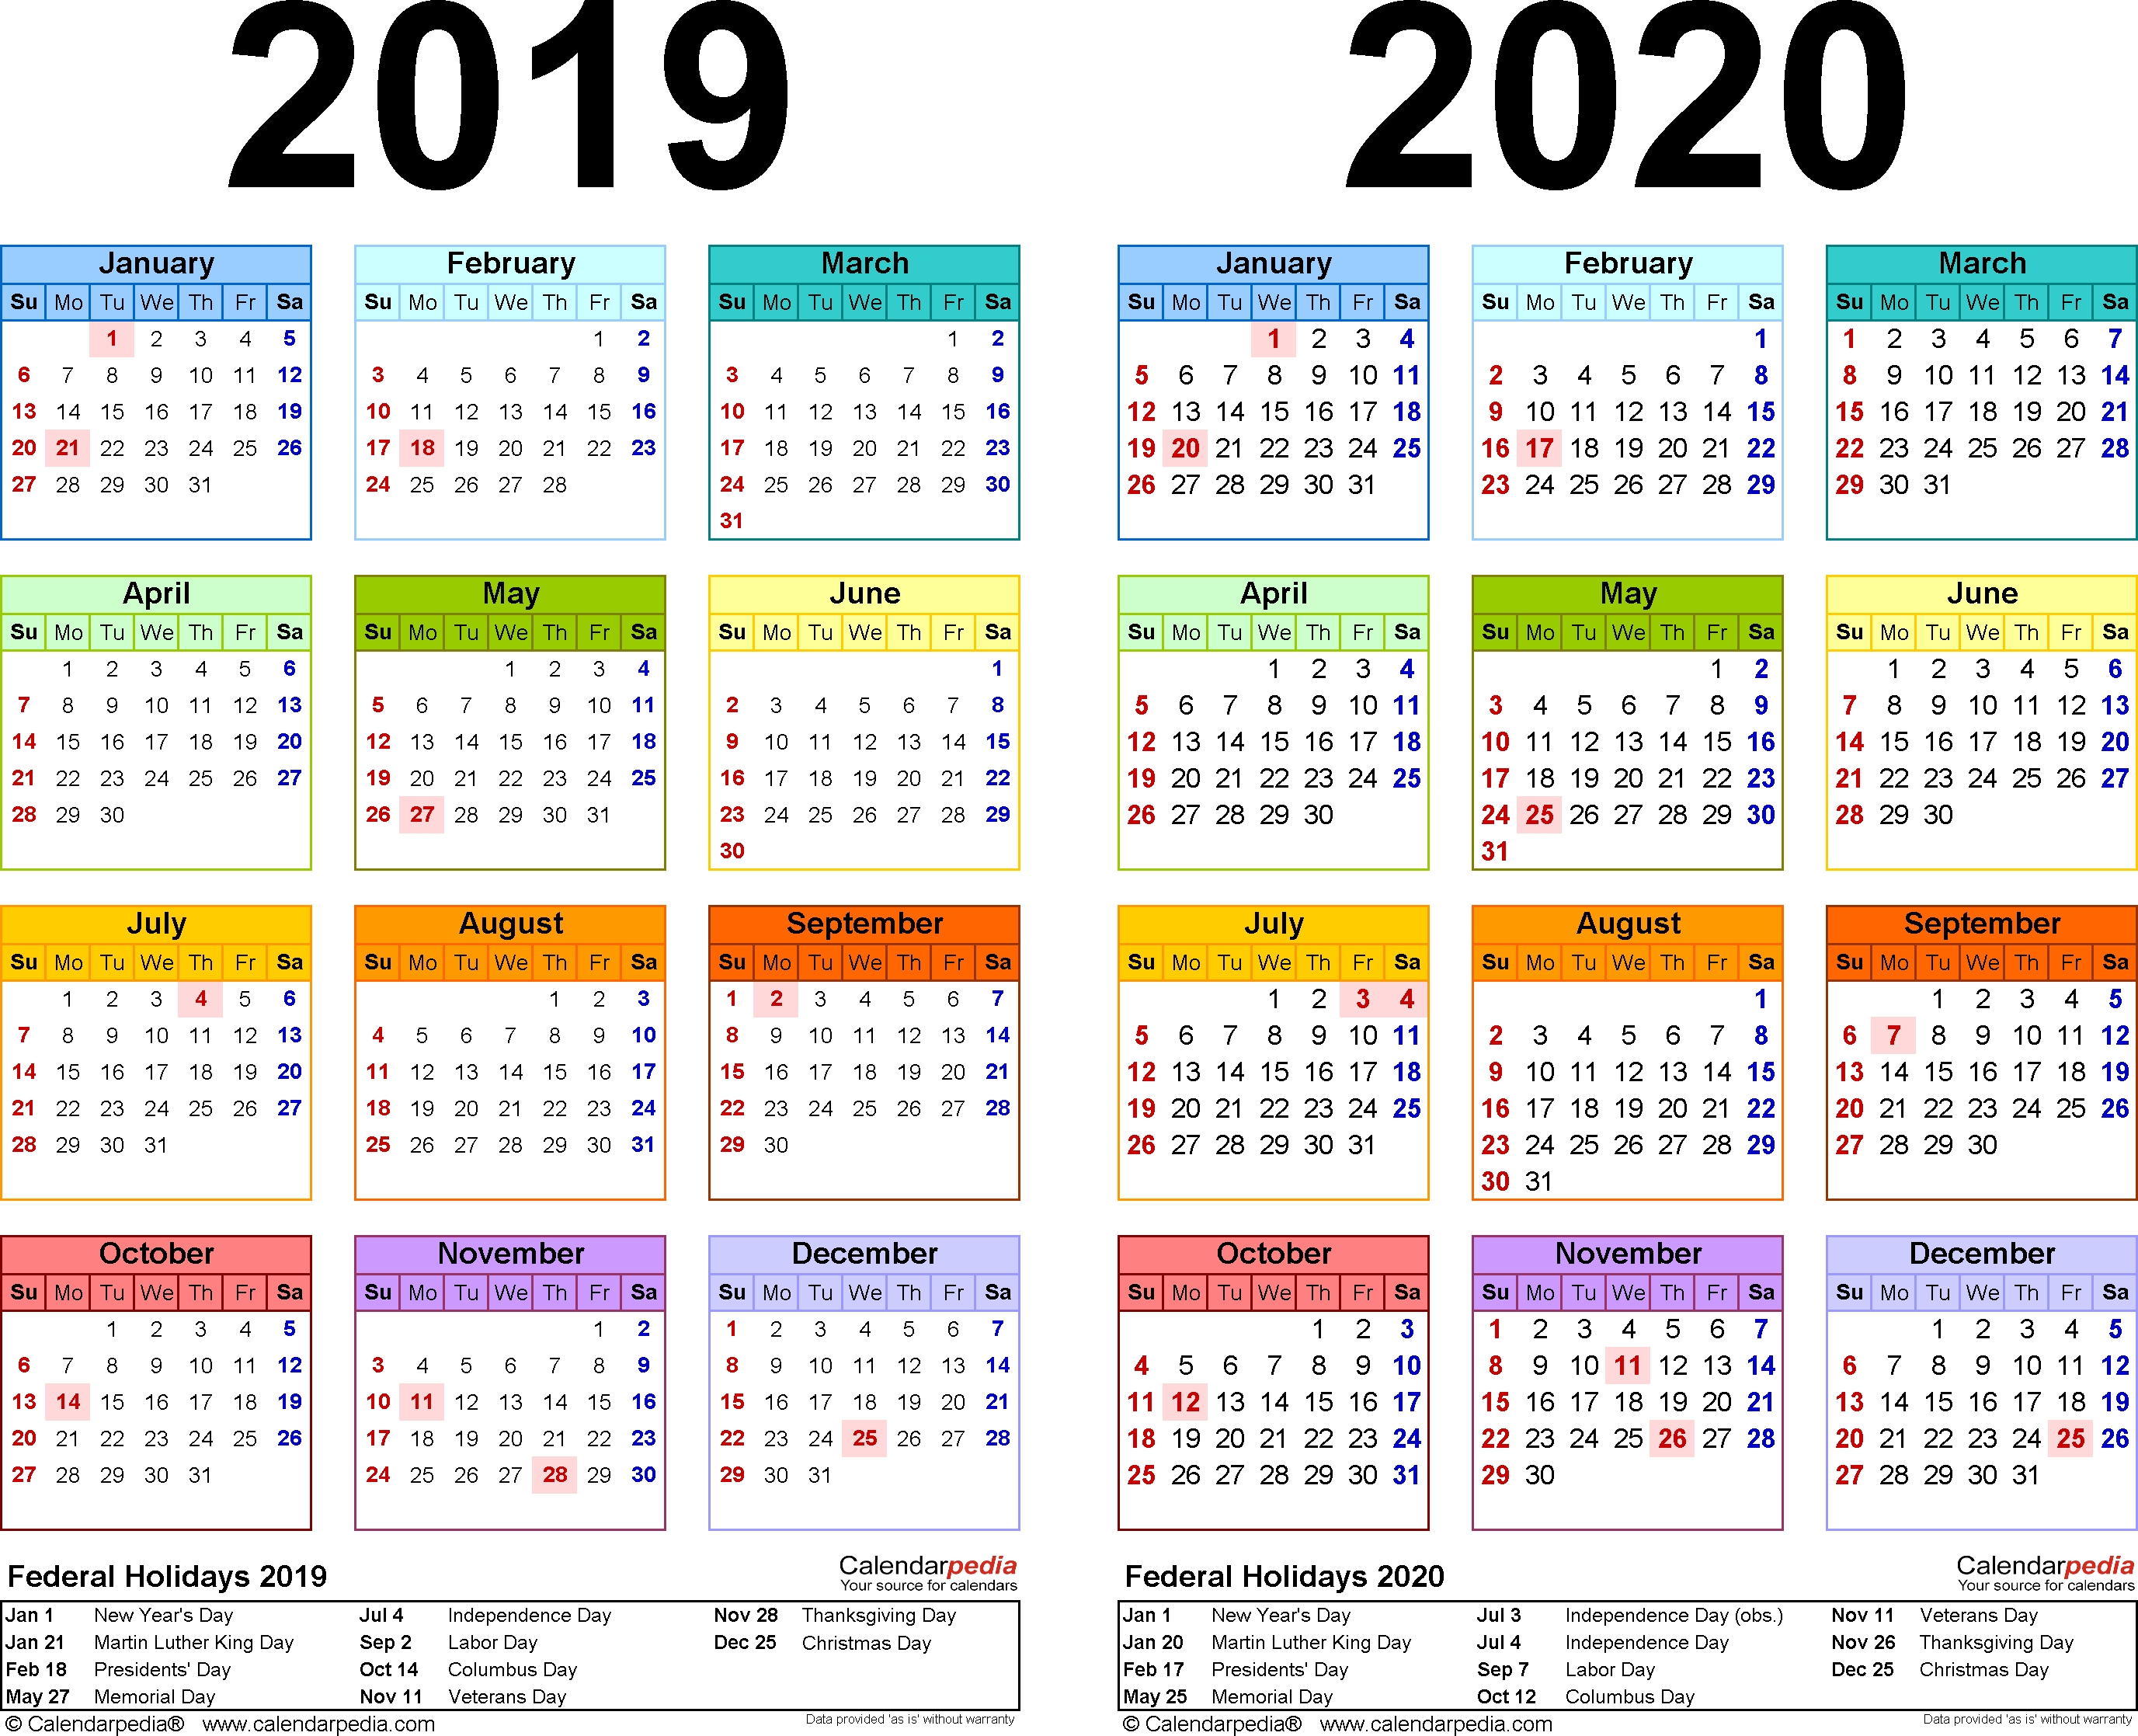 2019-2020 Calendar - Free Printable Two-Year Pdf Calendars inside Free Printable 2019-2020 Academic Calendar